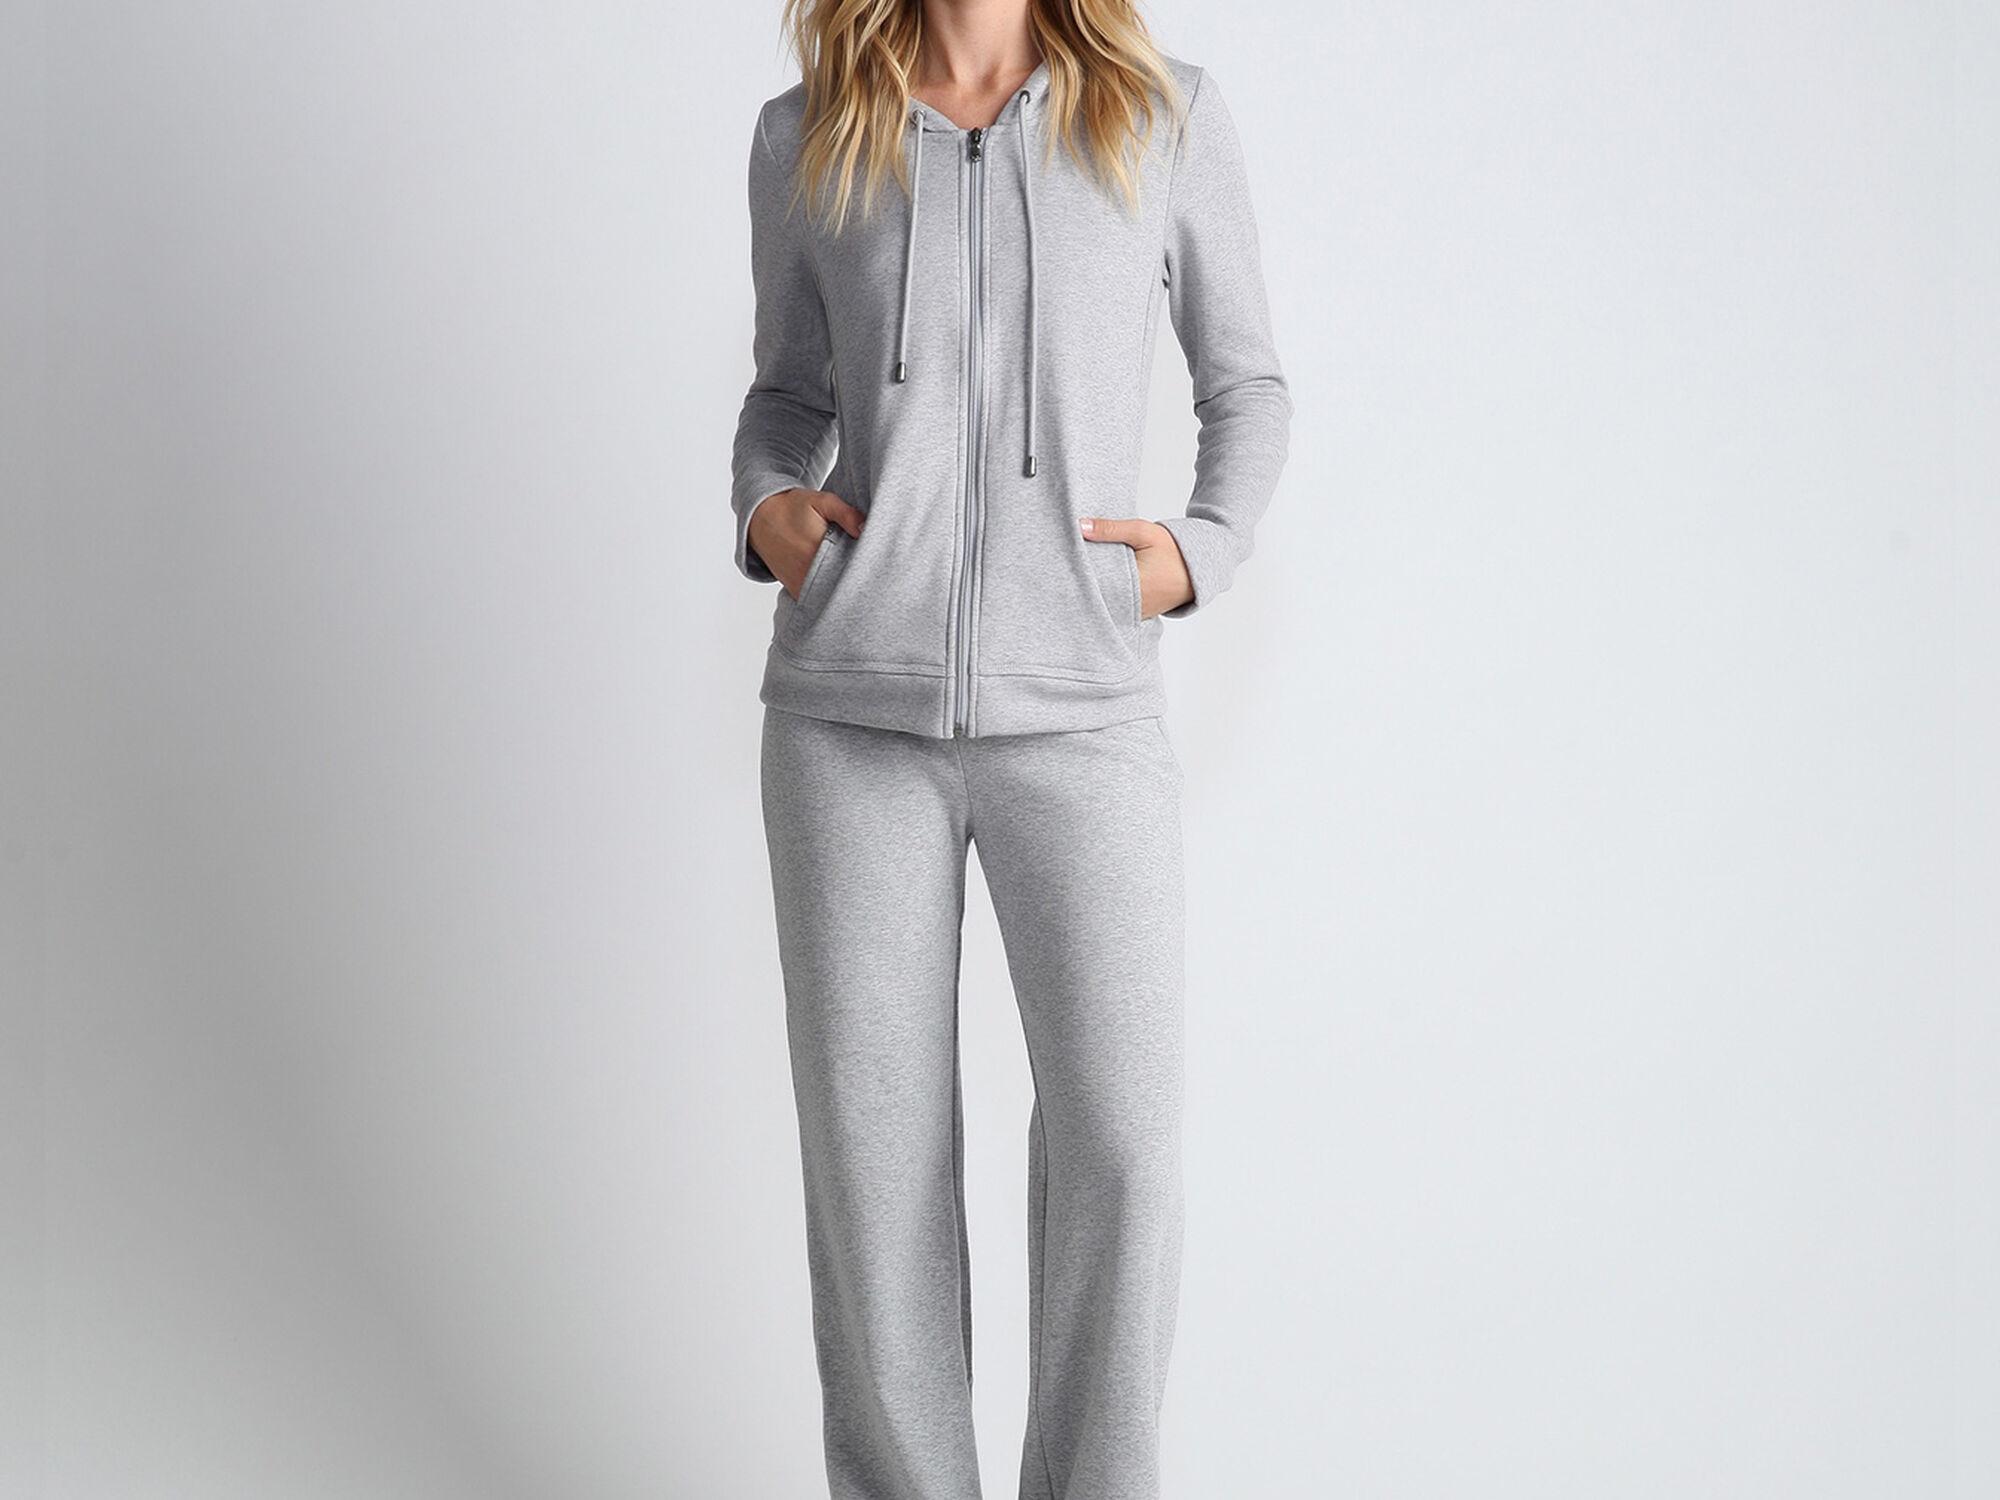 UGG Cotton Women's Oralyn Pants in Seal Heather (Grey)